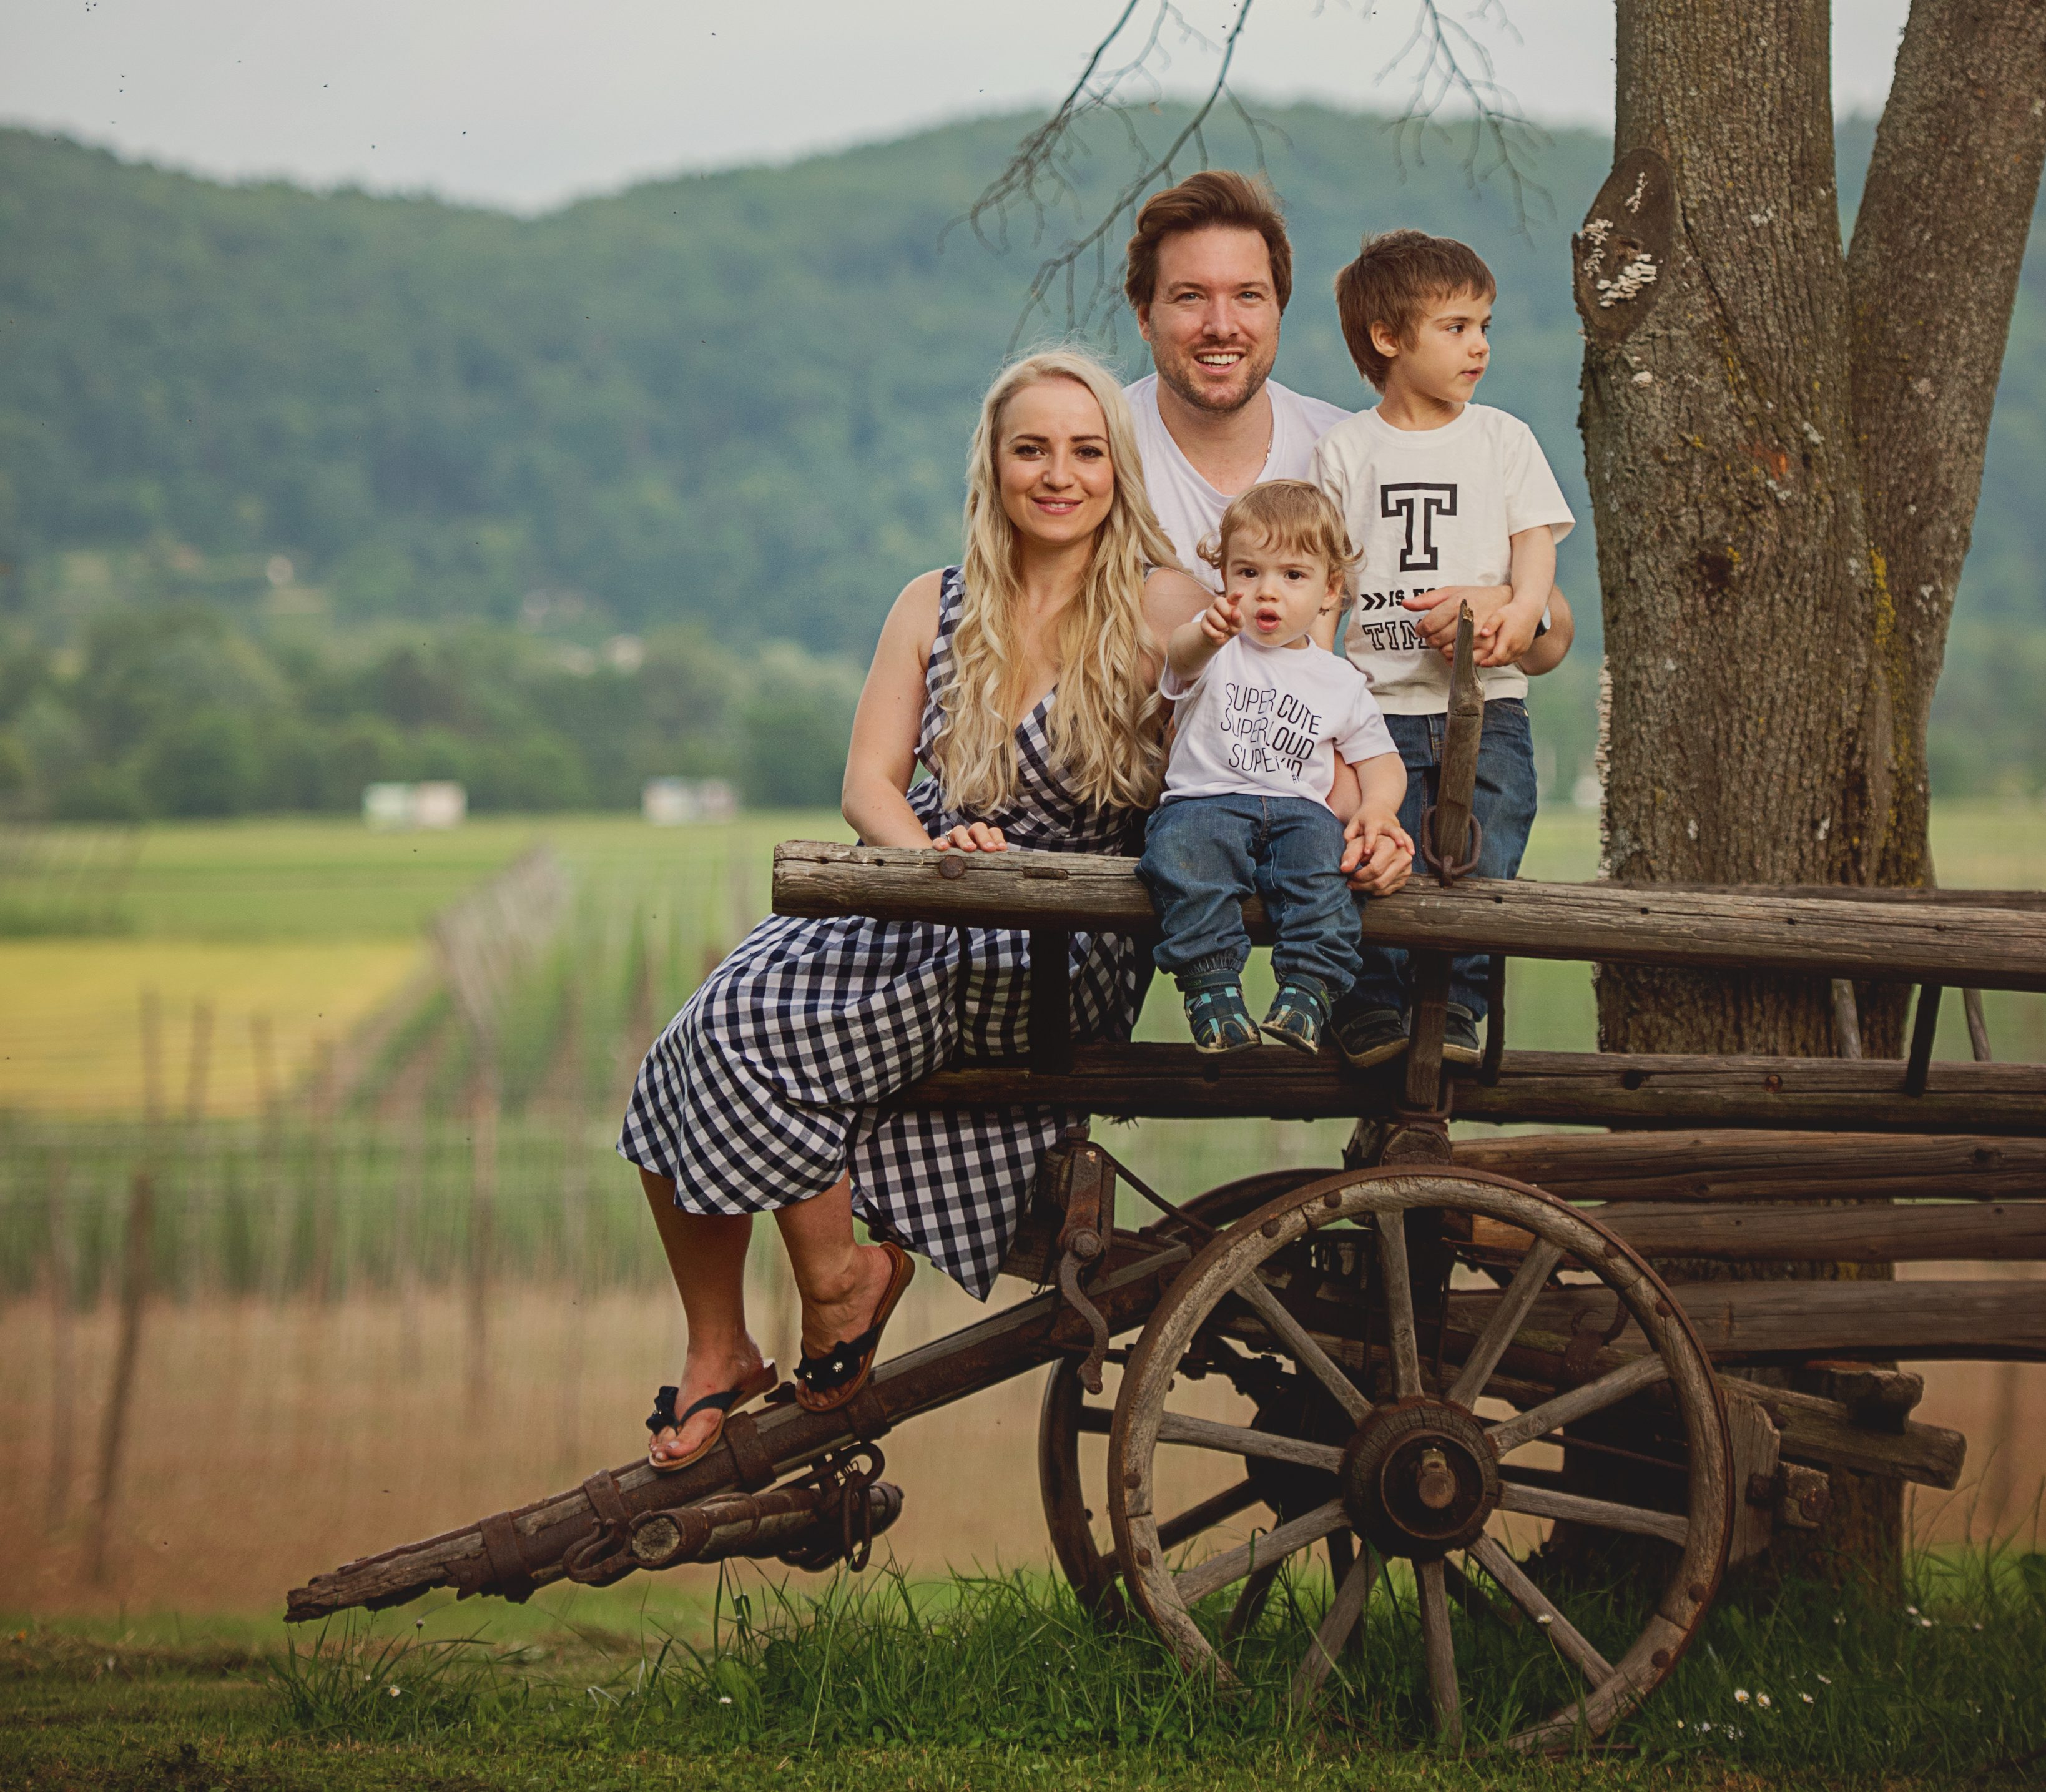 ANA ŽONTAR KRISTANC AND FAMILY